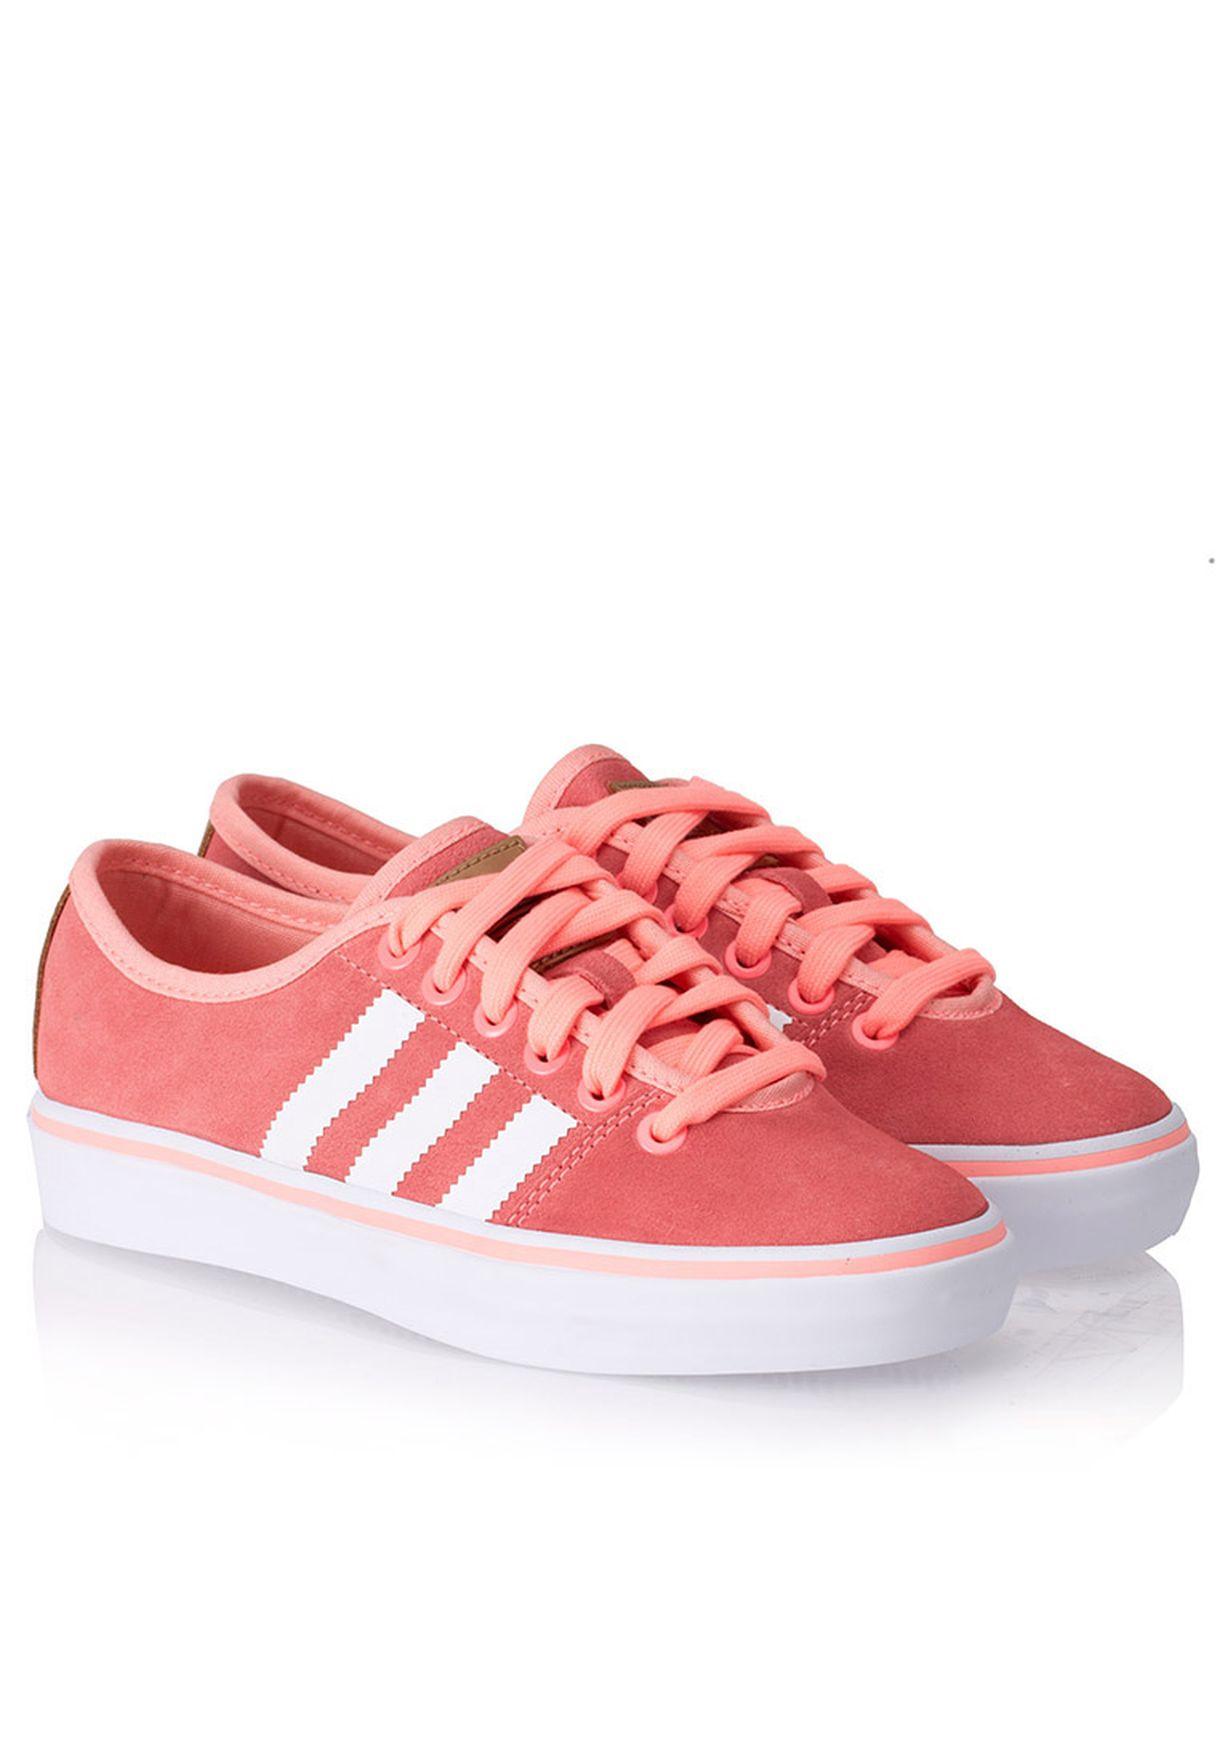 121f3ef46682 Shop adidas Originals pink Adria Lo Sneakers B25810 for Women in UAE ...